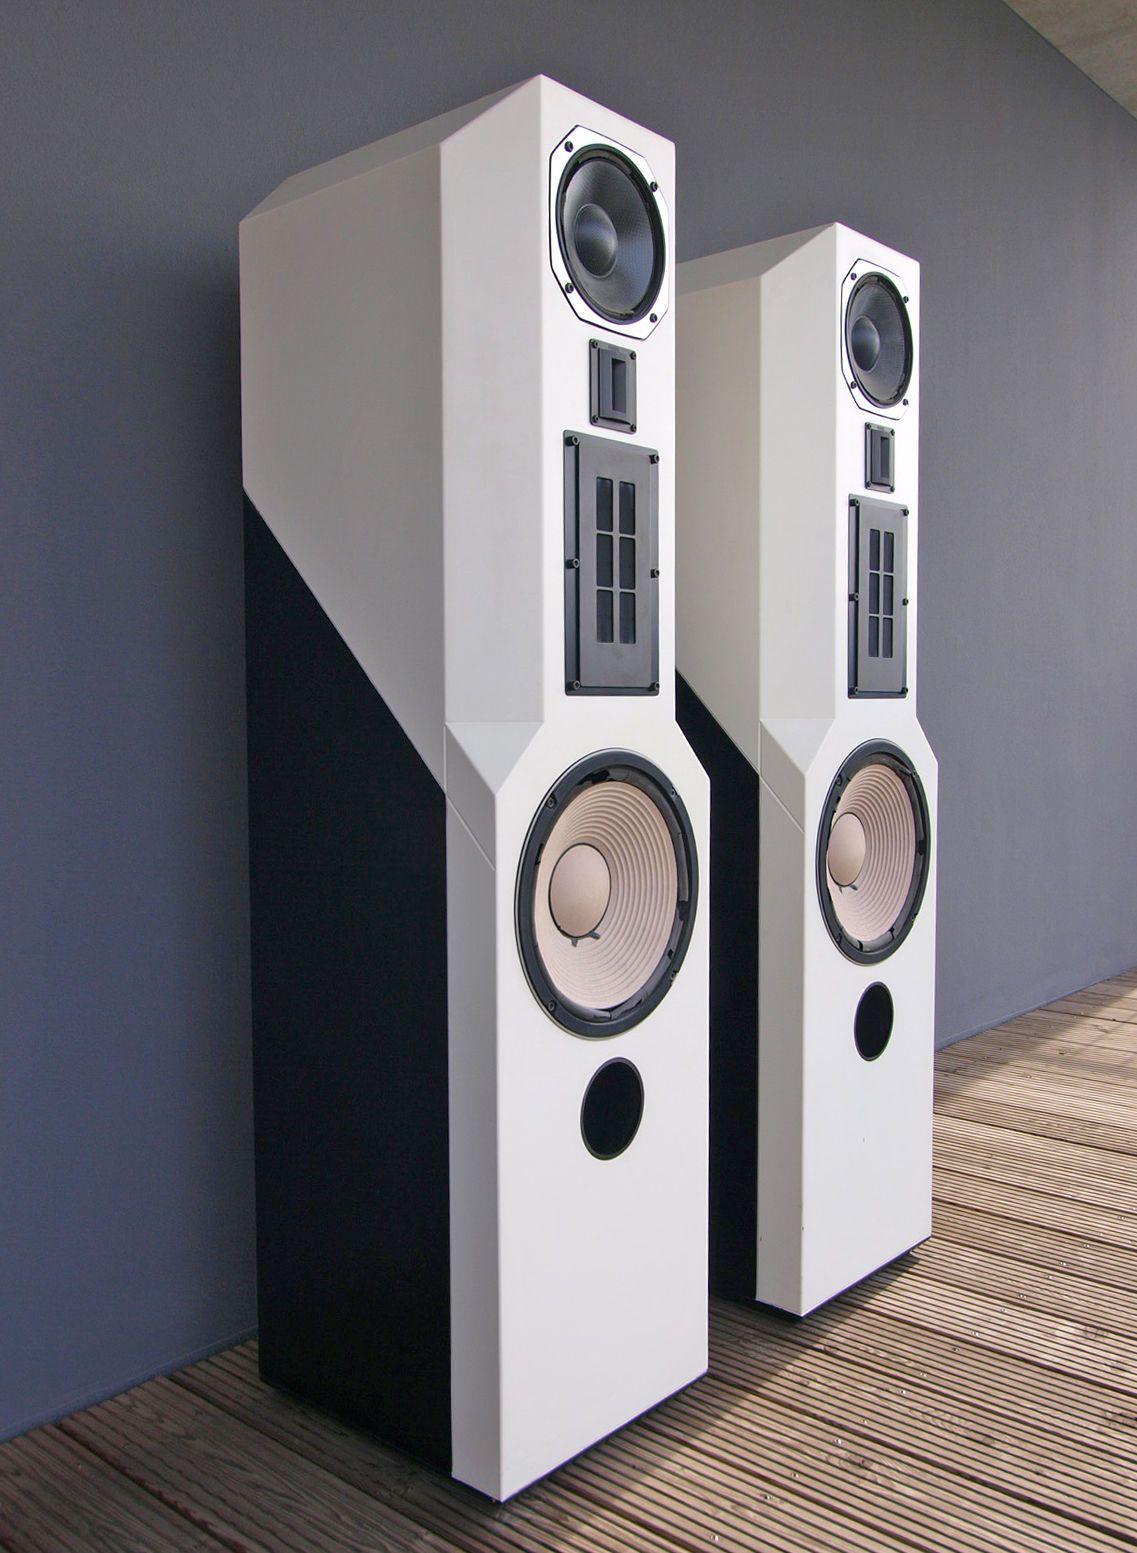 lautsprecher acr isostatic rp300 lack weiss schwarz in tv video audio heim audio hifi. Black Bedroom Furniture Sets. Home Design Ideas